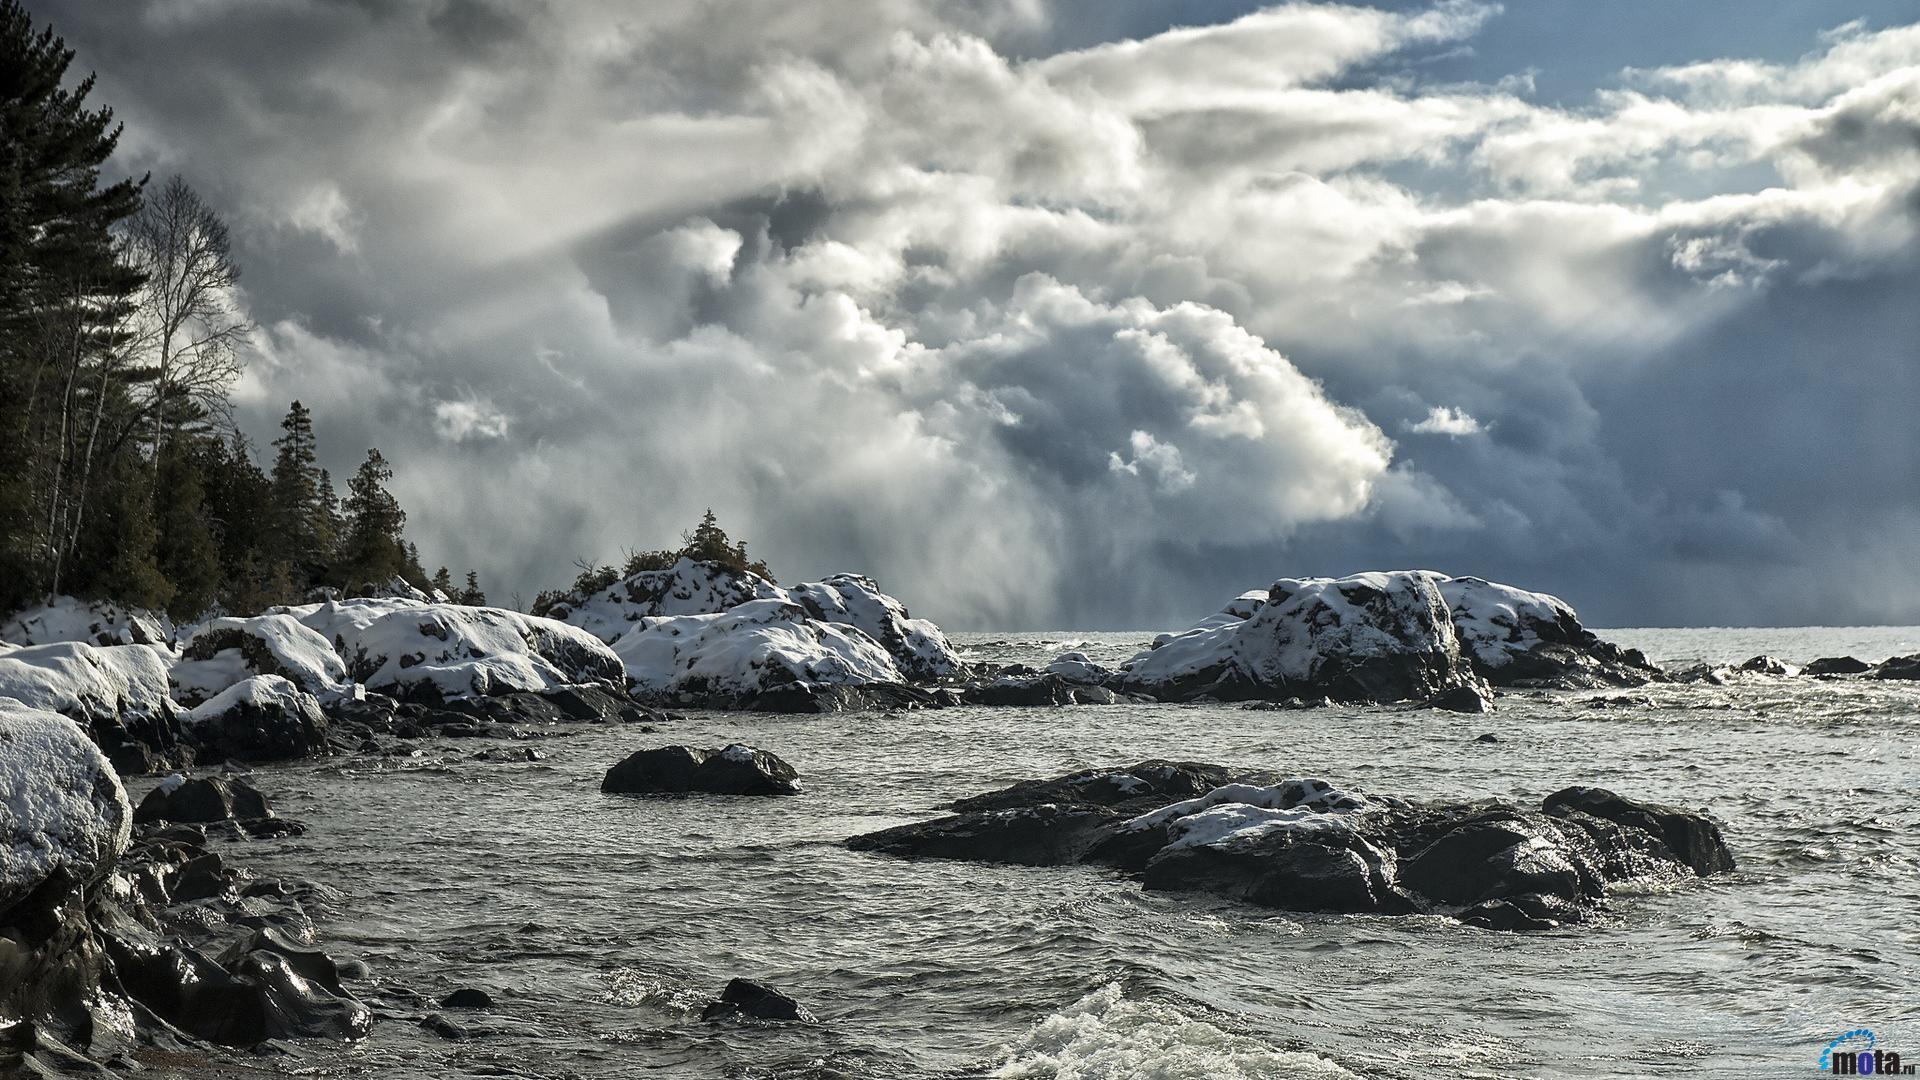 Wallpaper Snow storm over the lake (1920 x 1080 HDTV 1080p). Desktop .